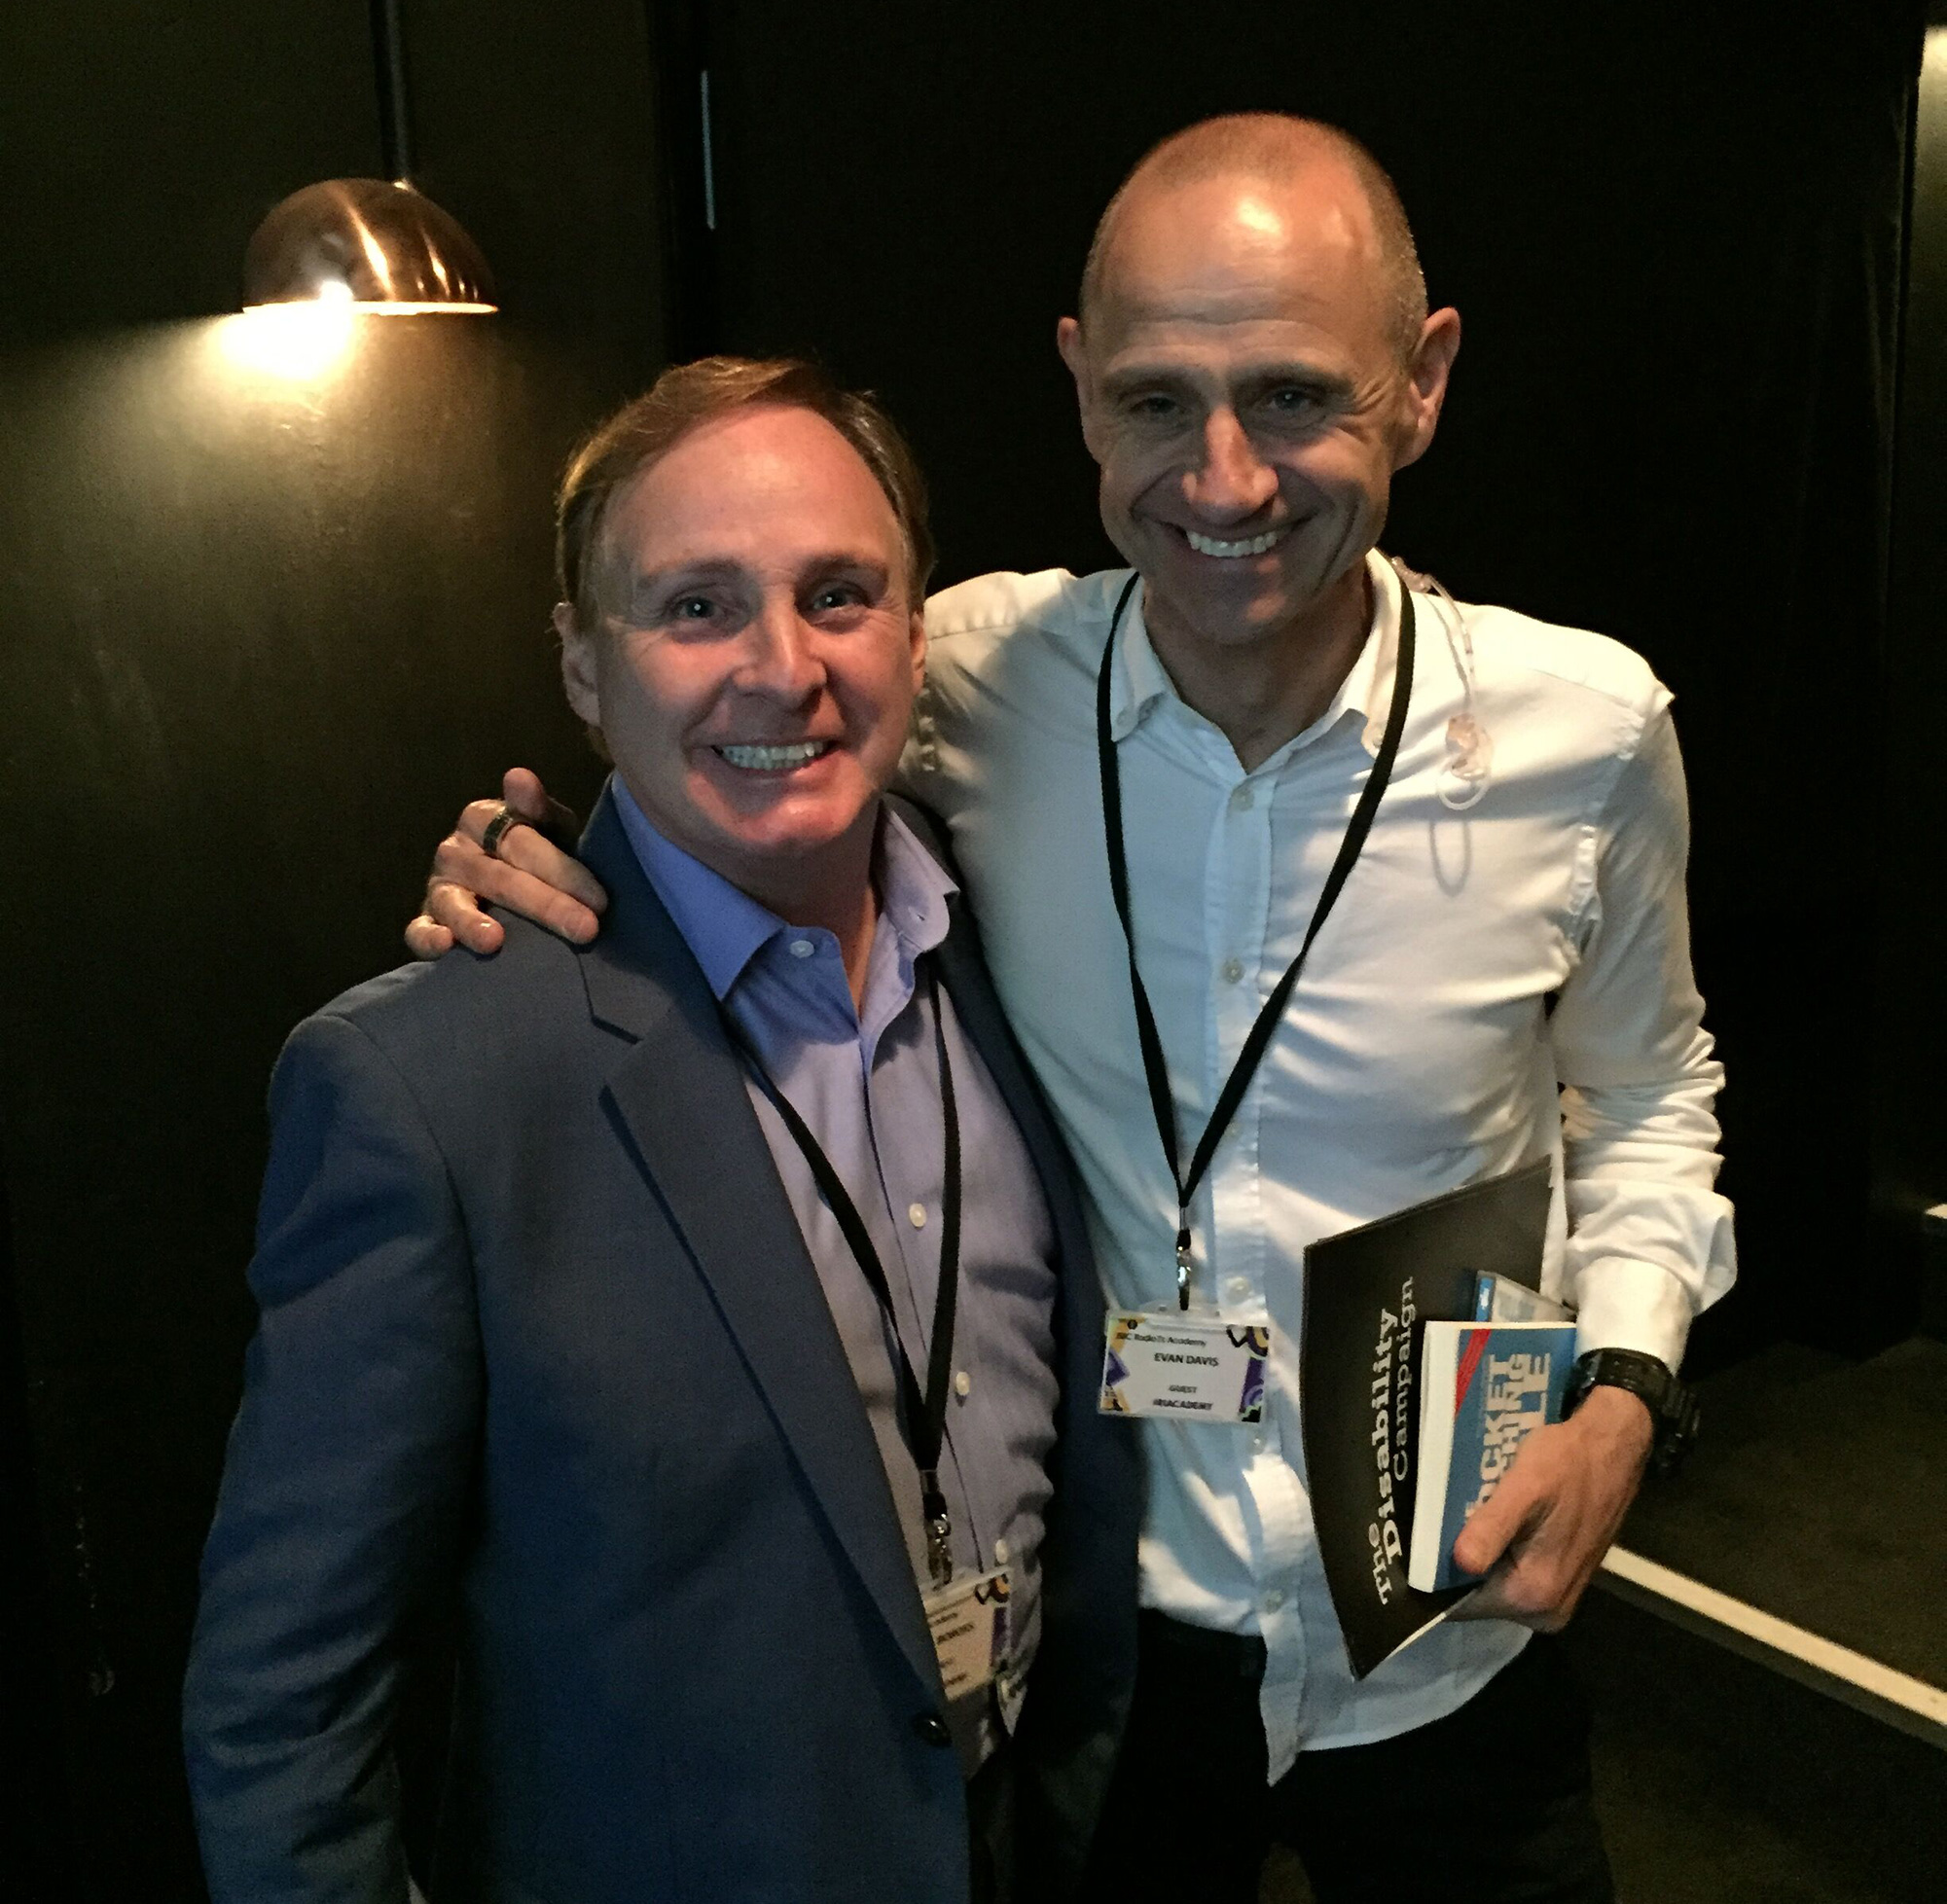 Paul Boross and BBC TV Dragon's Den presenter Evan Davis co hosting a media training day for BBC Radio 1.. Evan Davis is holding The Pocket Pitching Bible 1